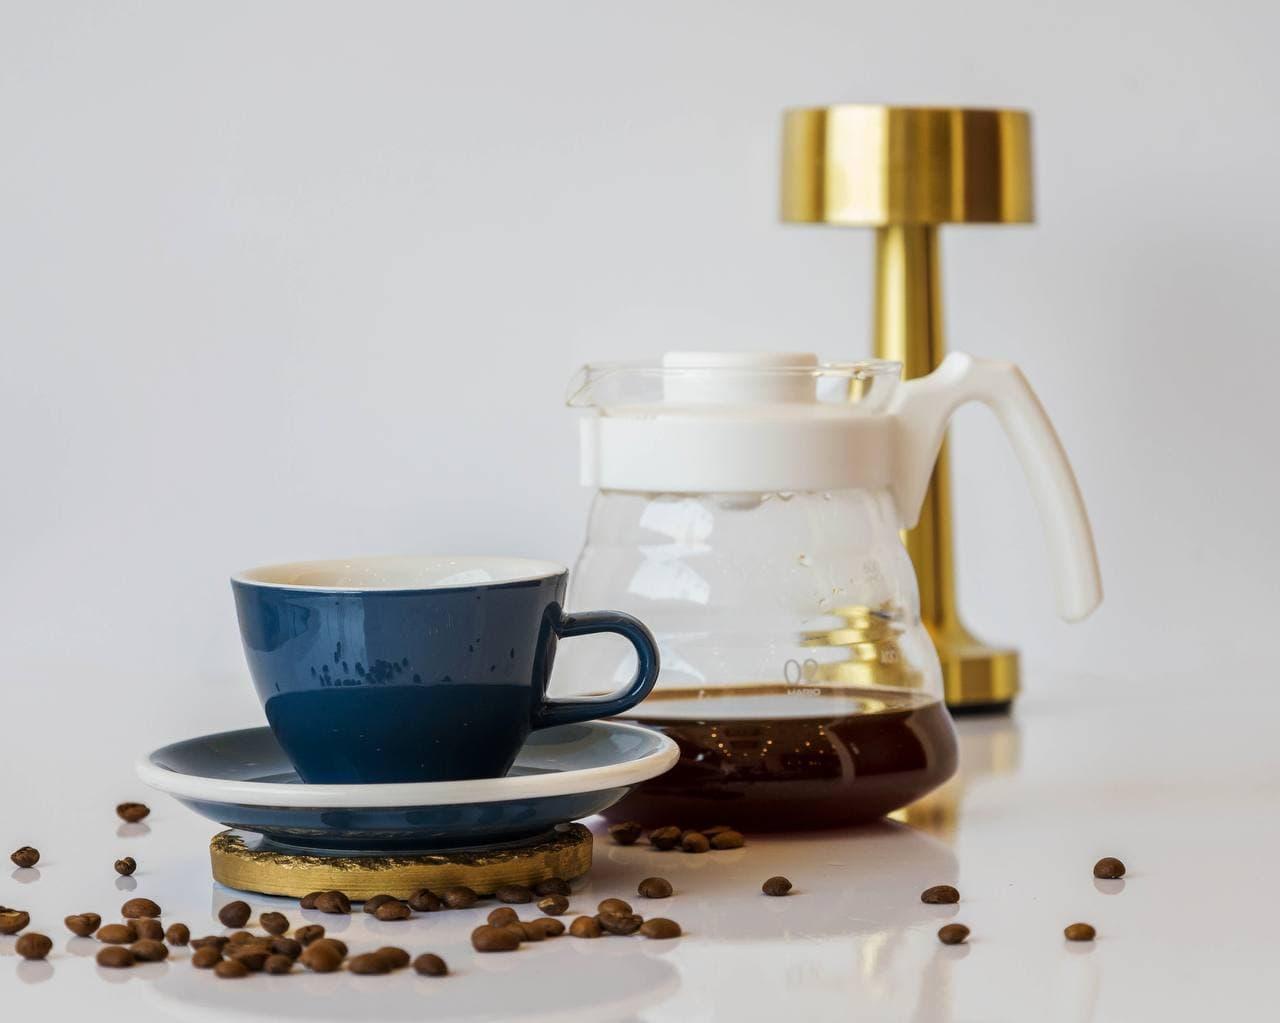 MANUAL BREW COFFEE V60